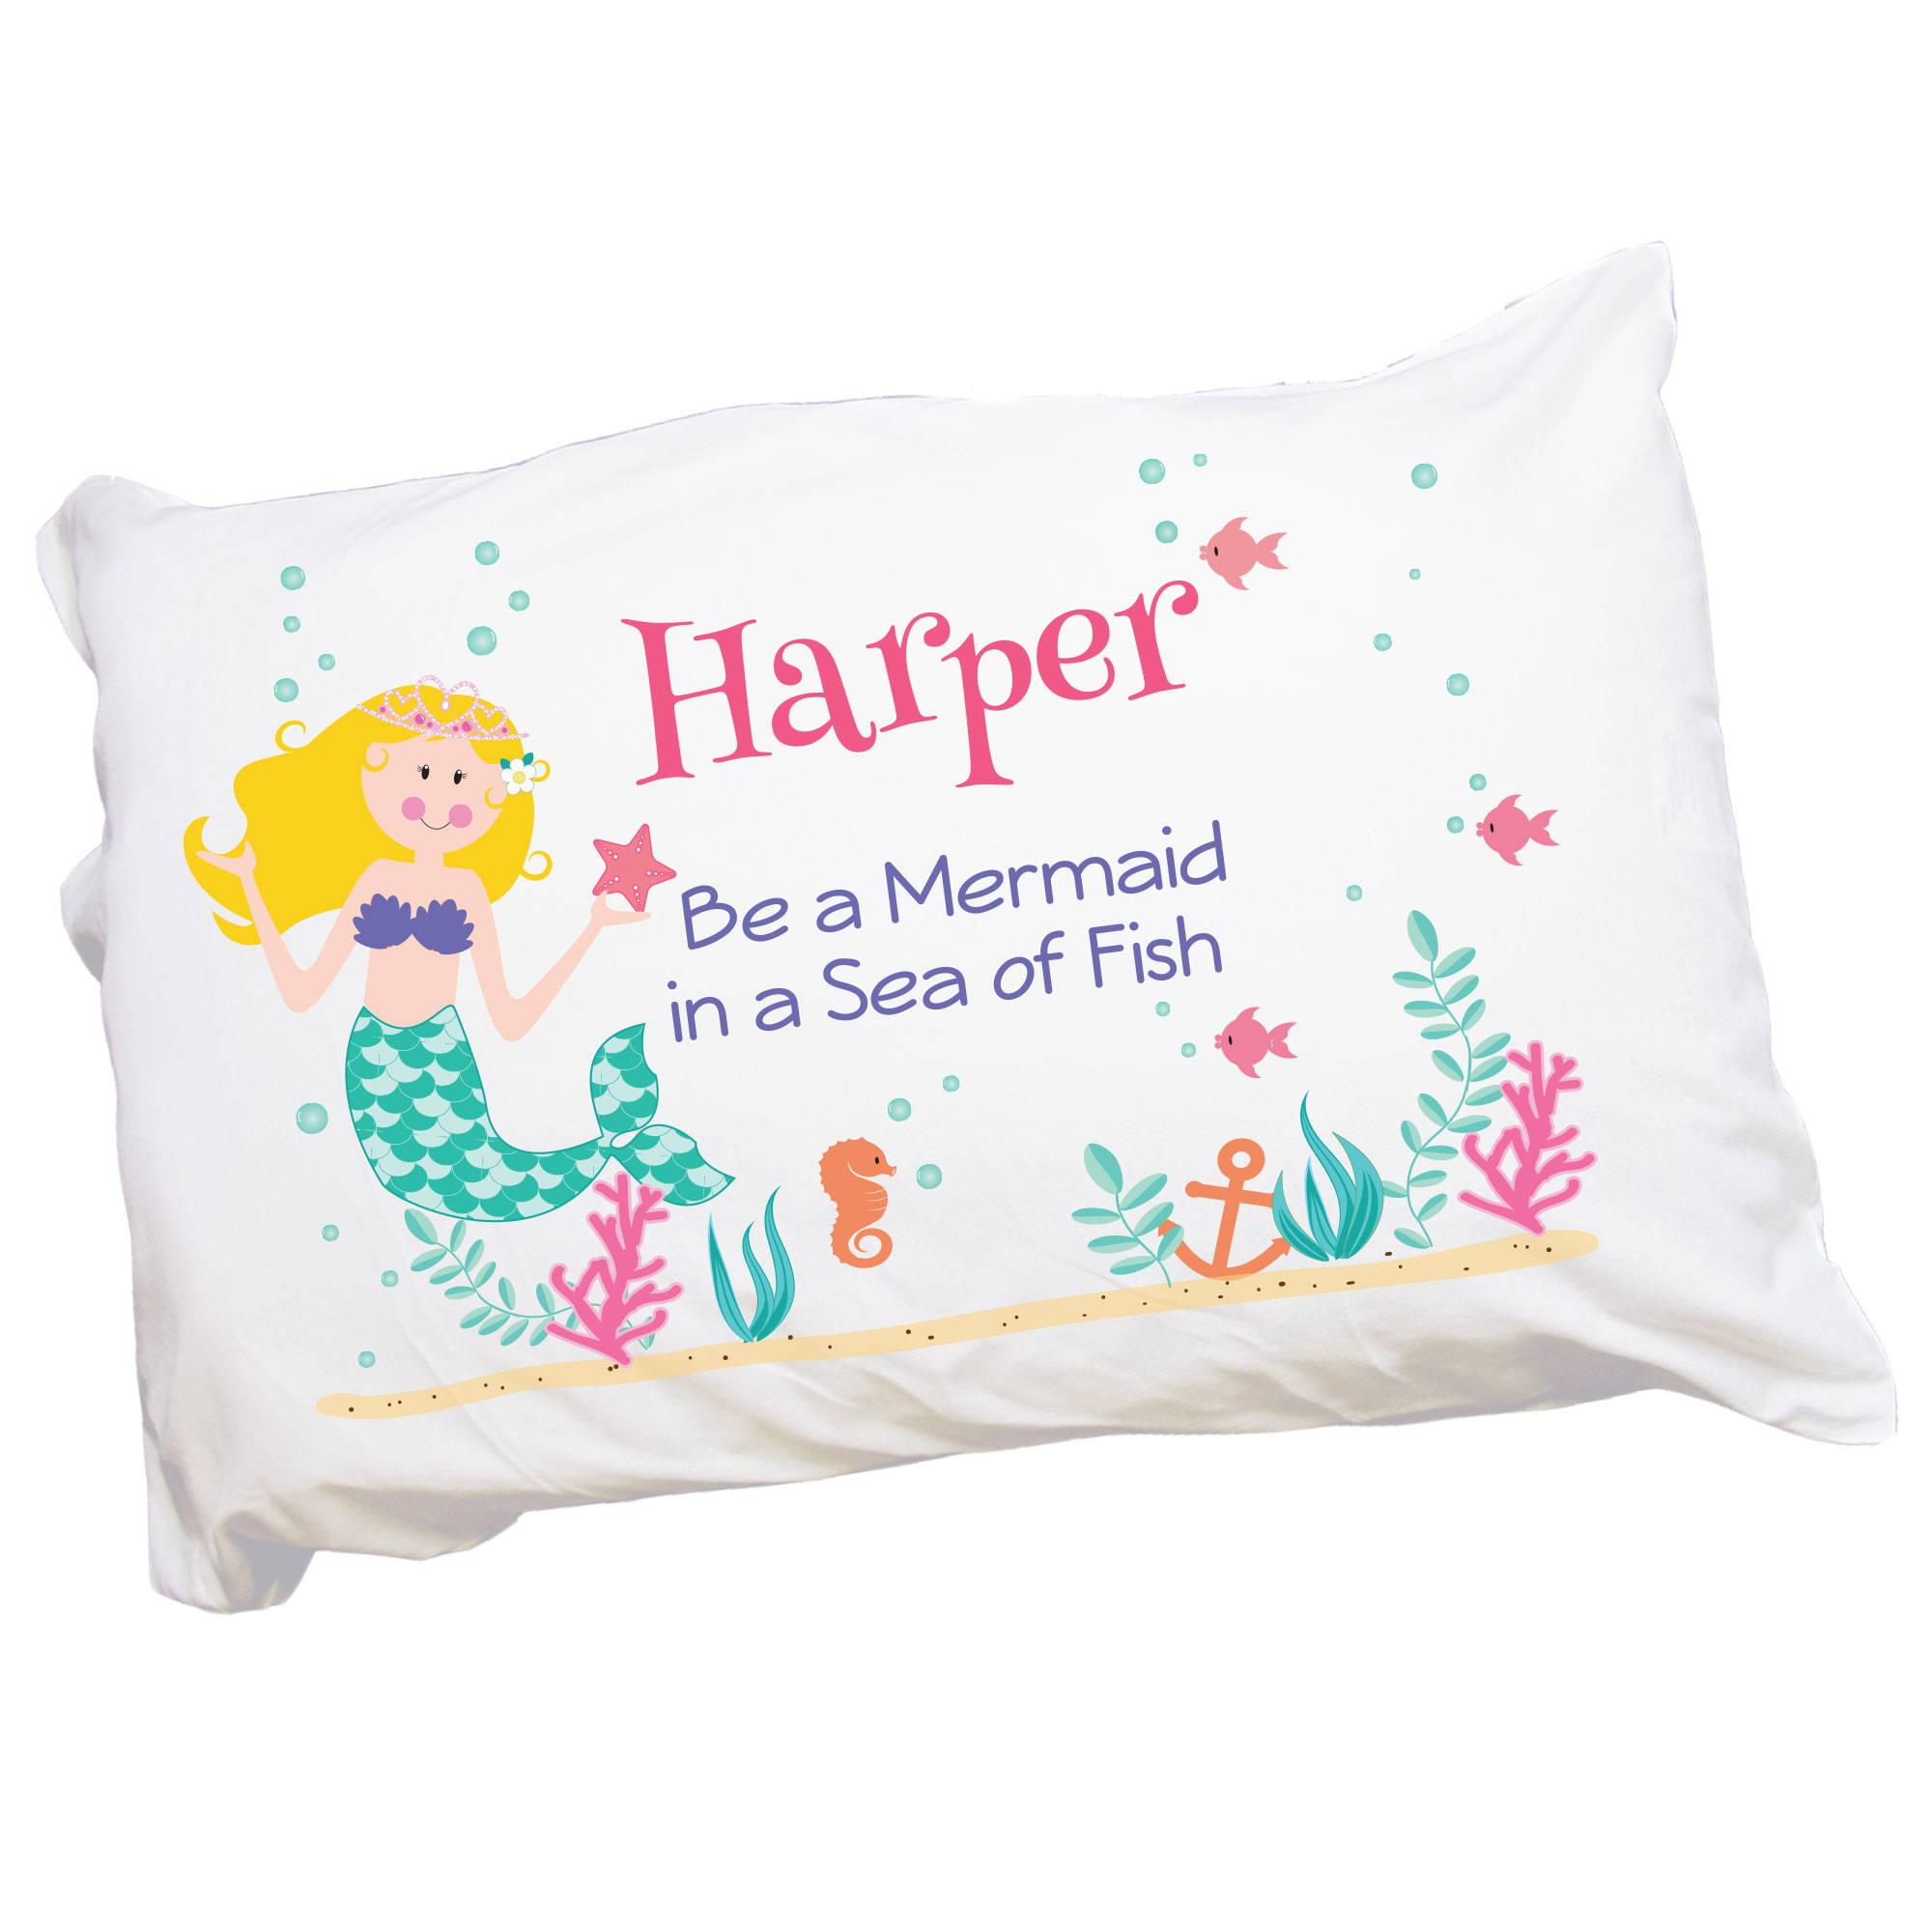 personalized mermaid pillowcase